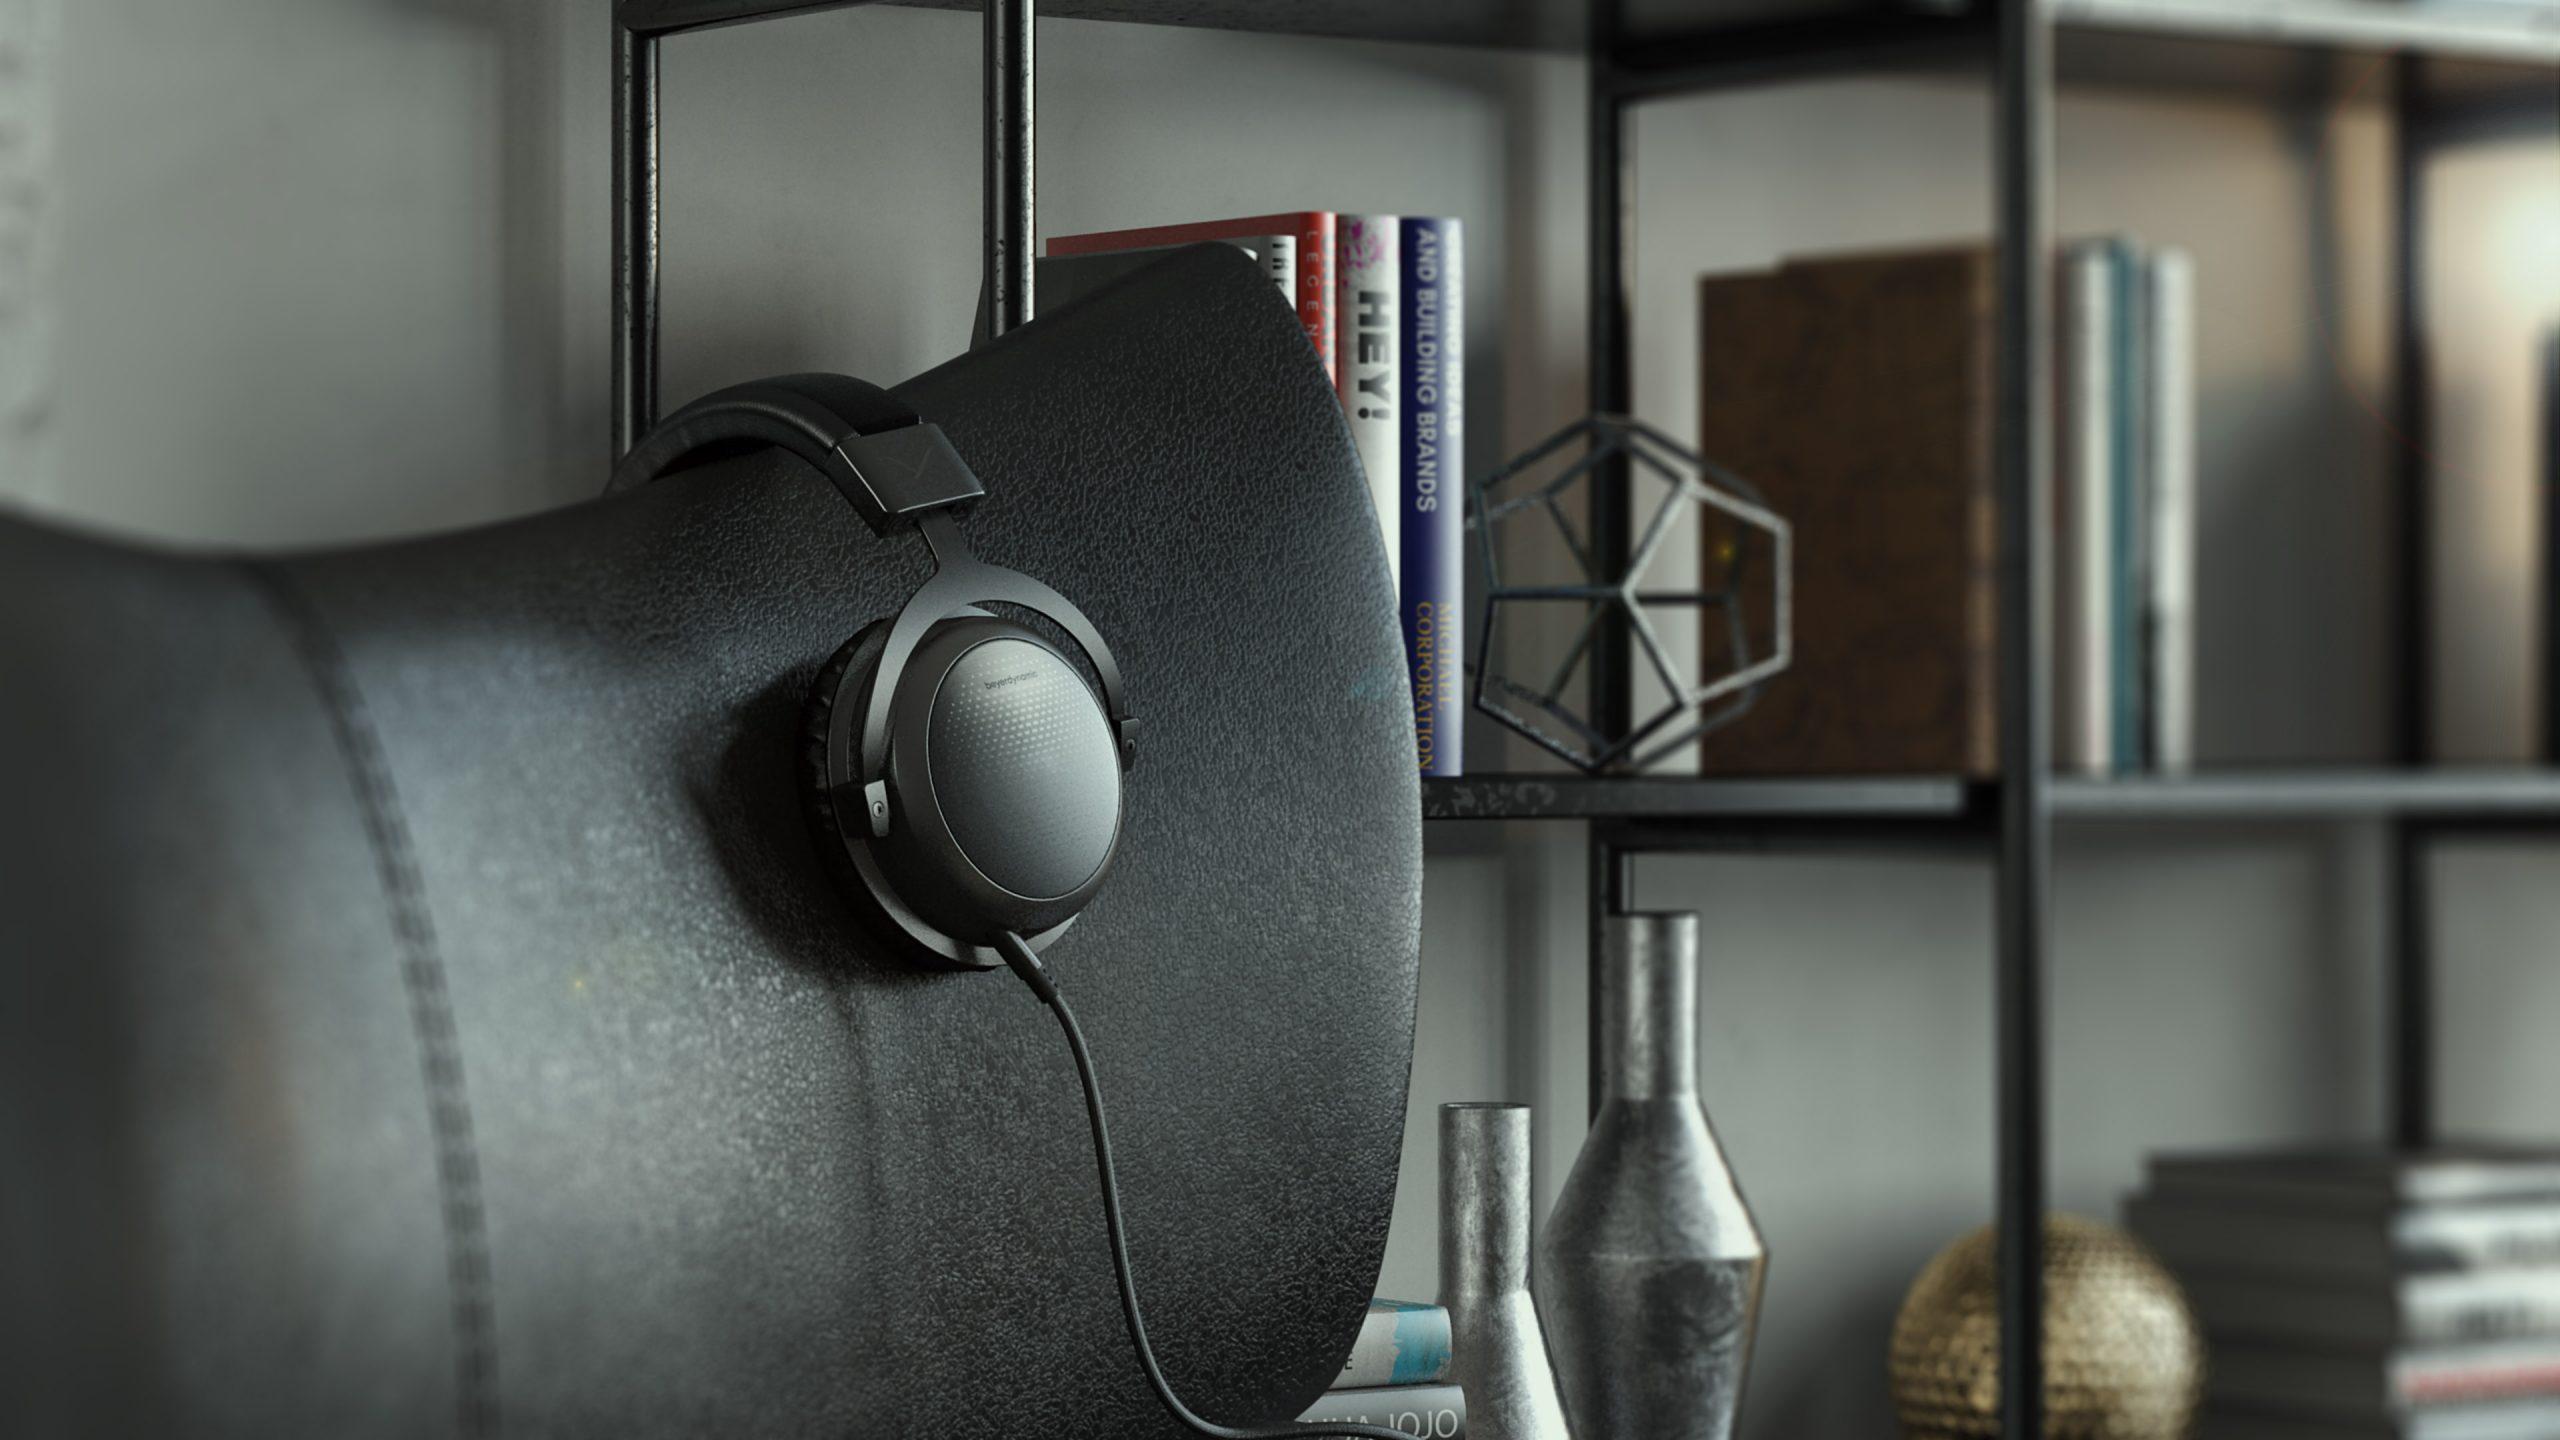 New beyerdynamic headphones